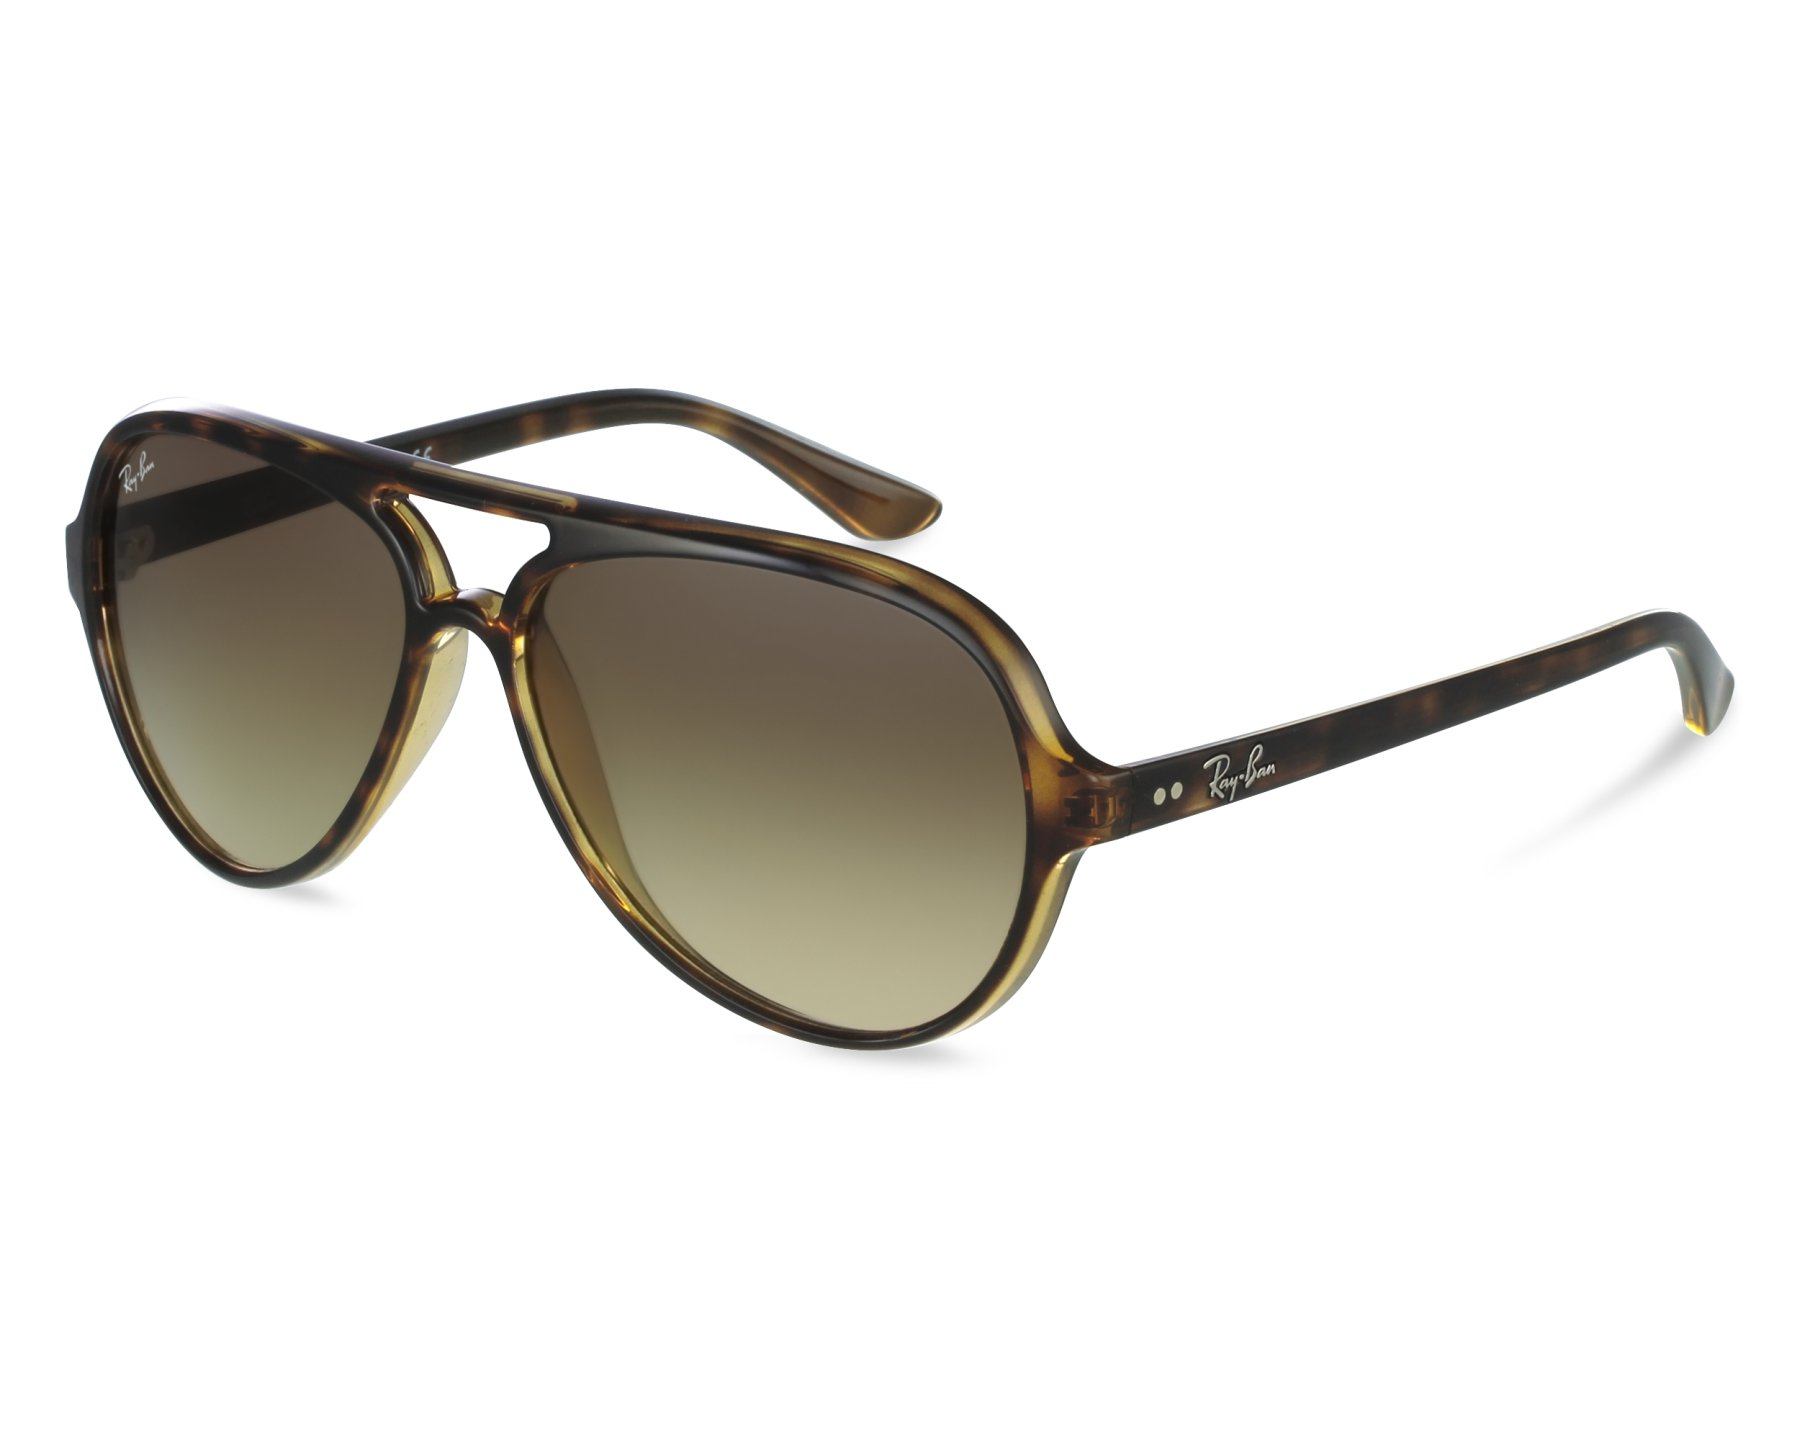 fe6fbe44fd1 italy sunglasses ray ban rb 4125 710 51 59 12 havana front view c275e 74da0